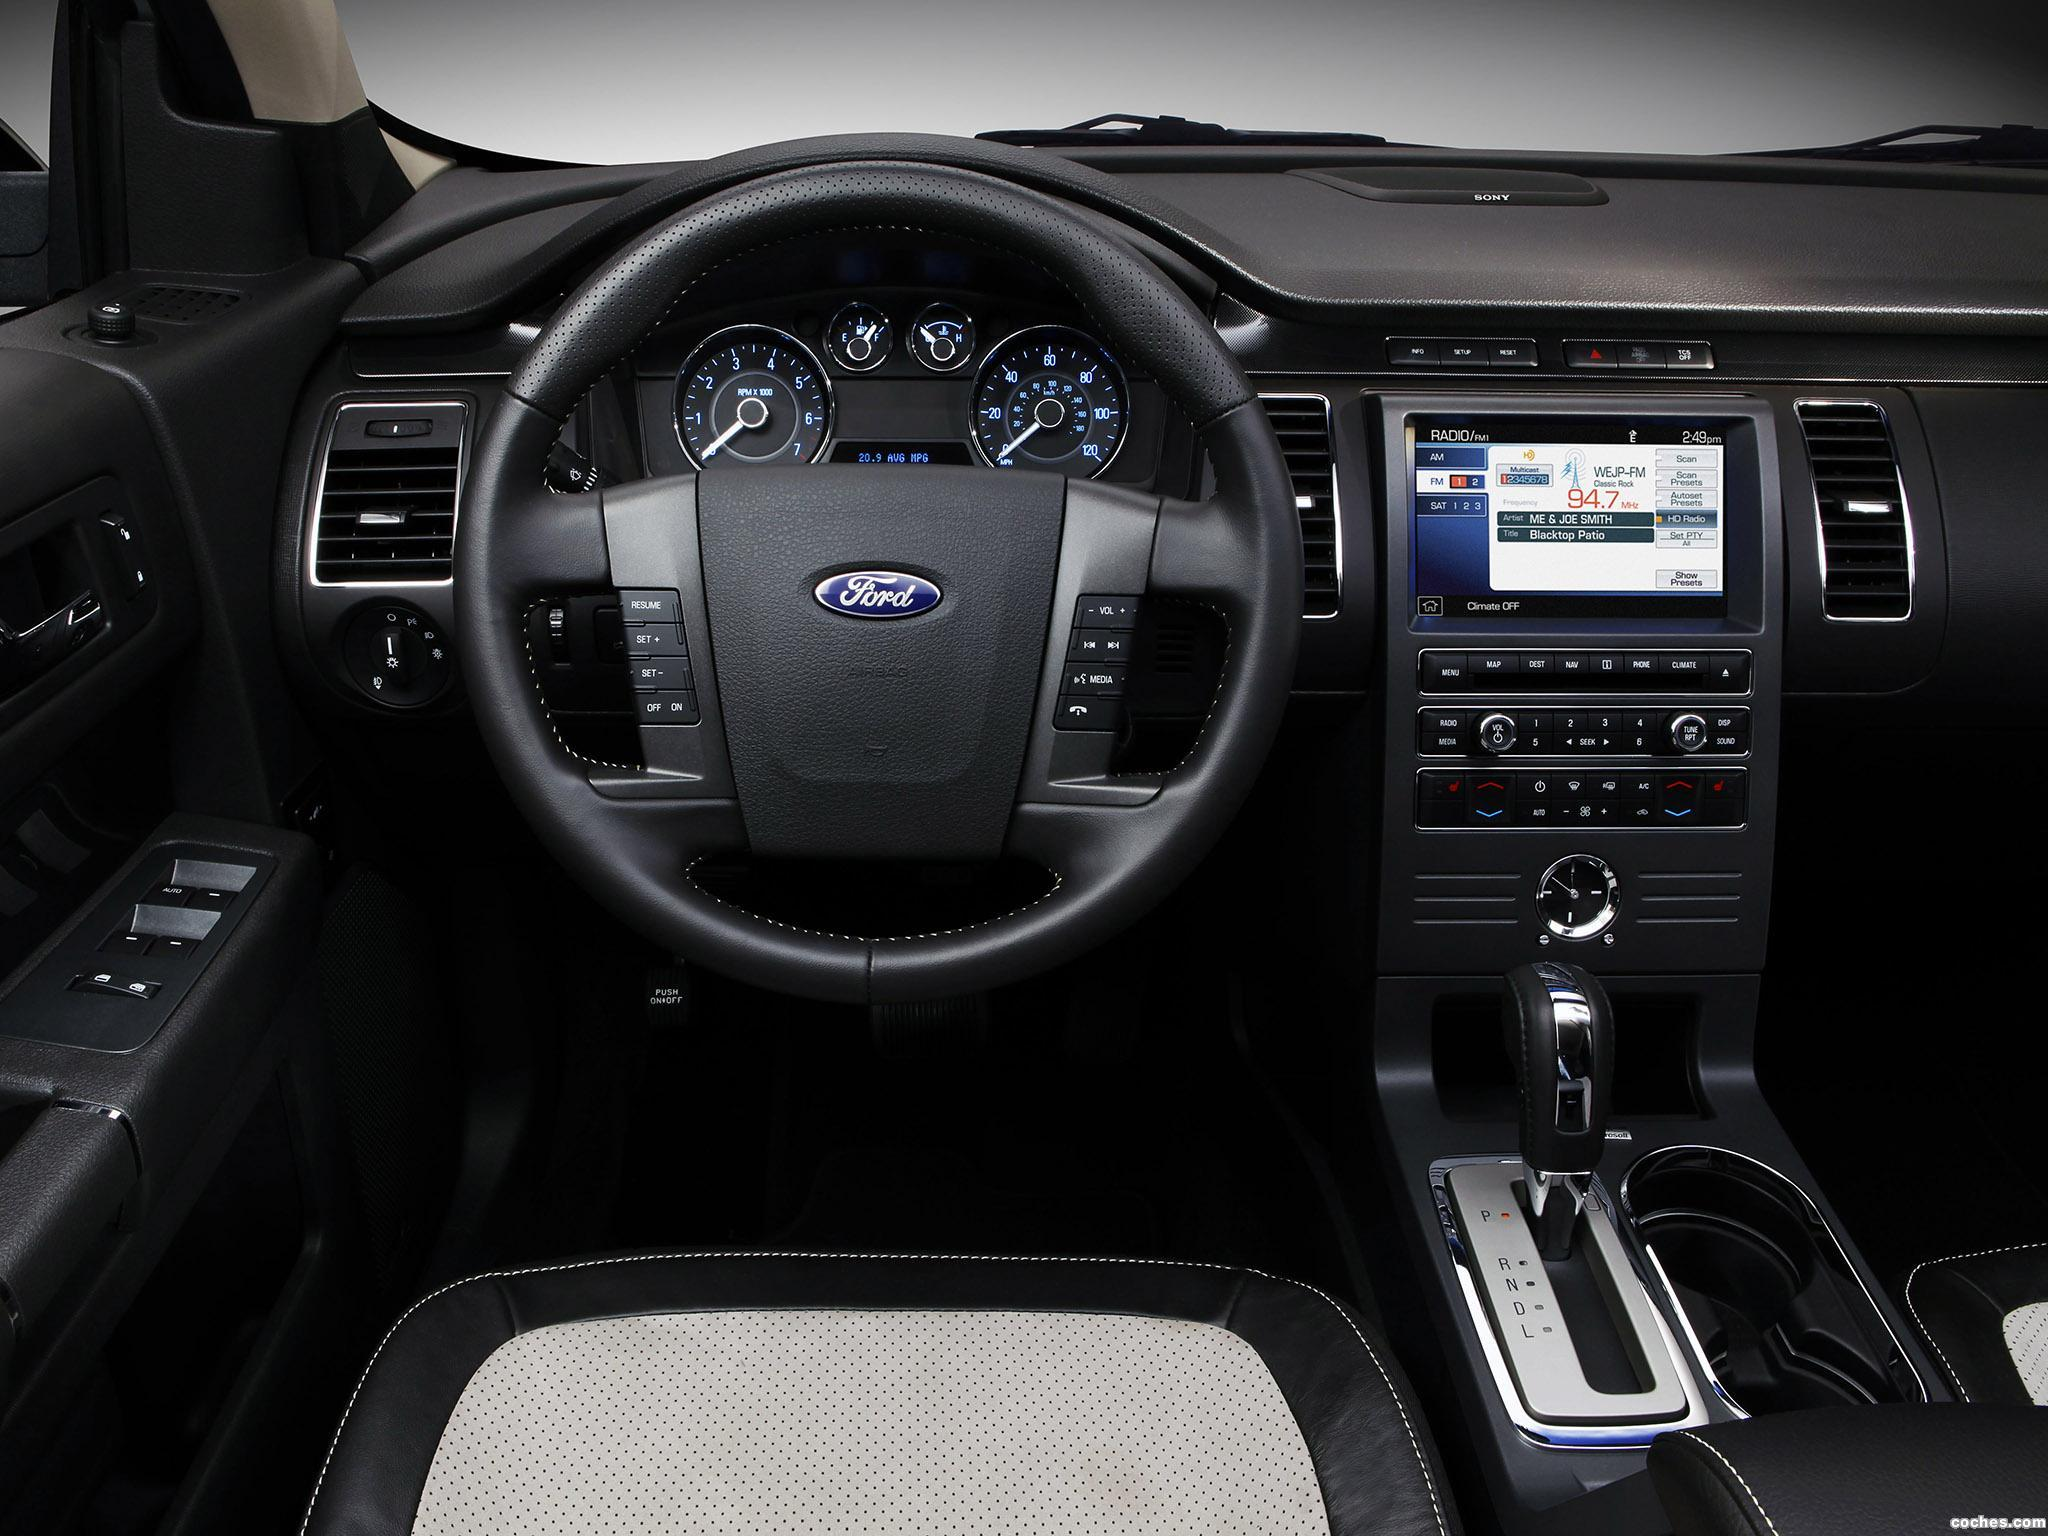 Foto 2 de Ford Flex Titanium 2011